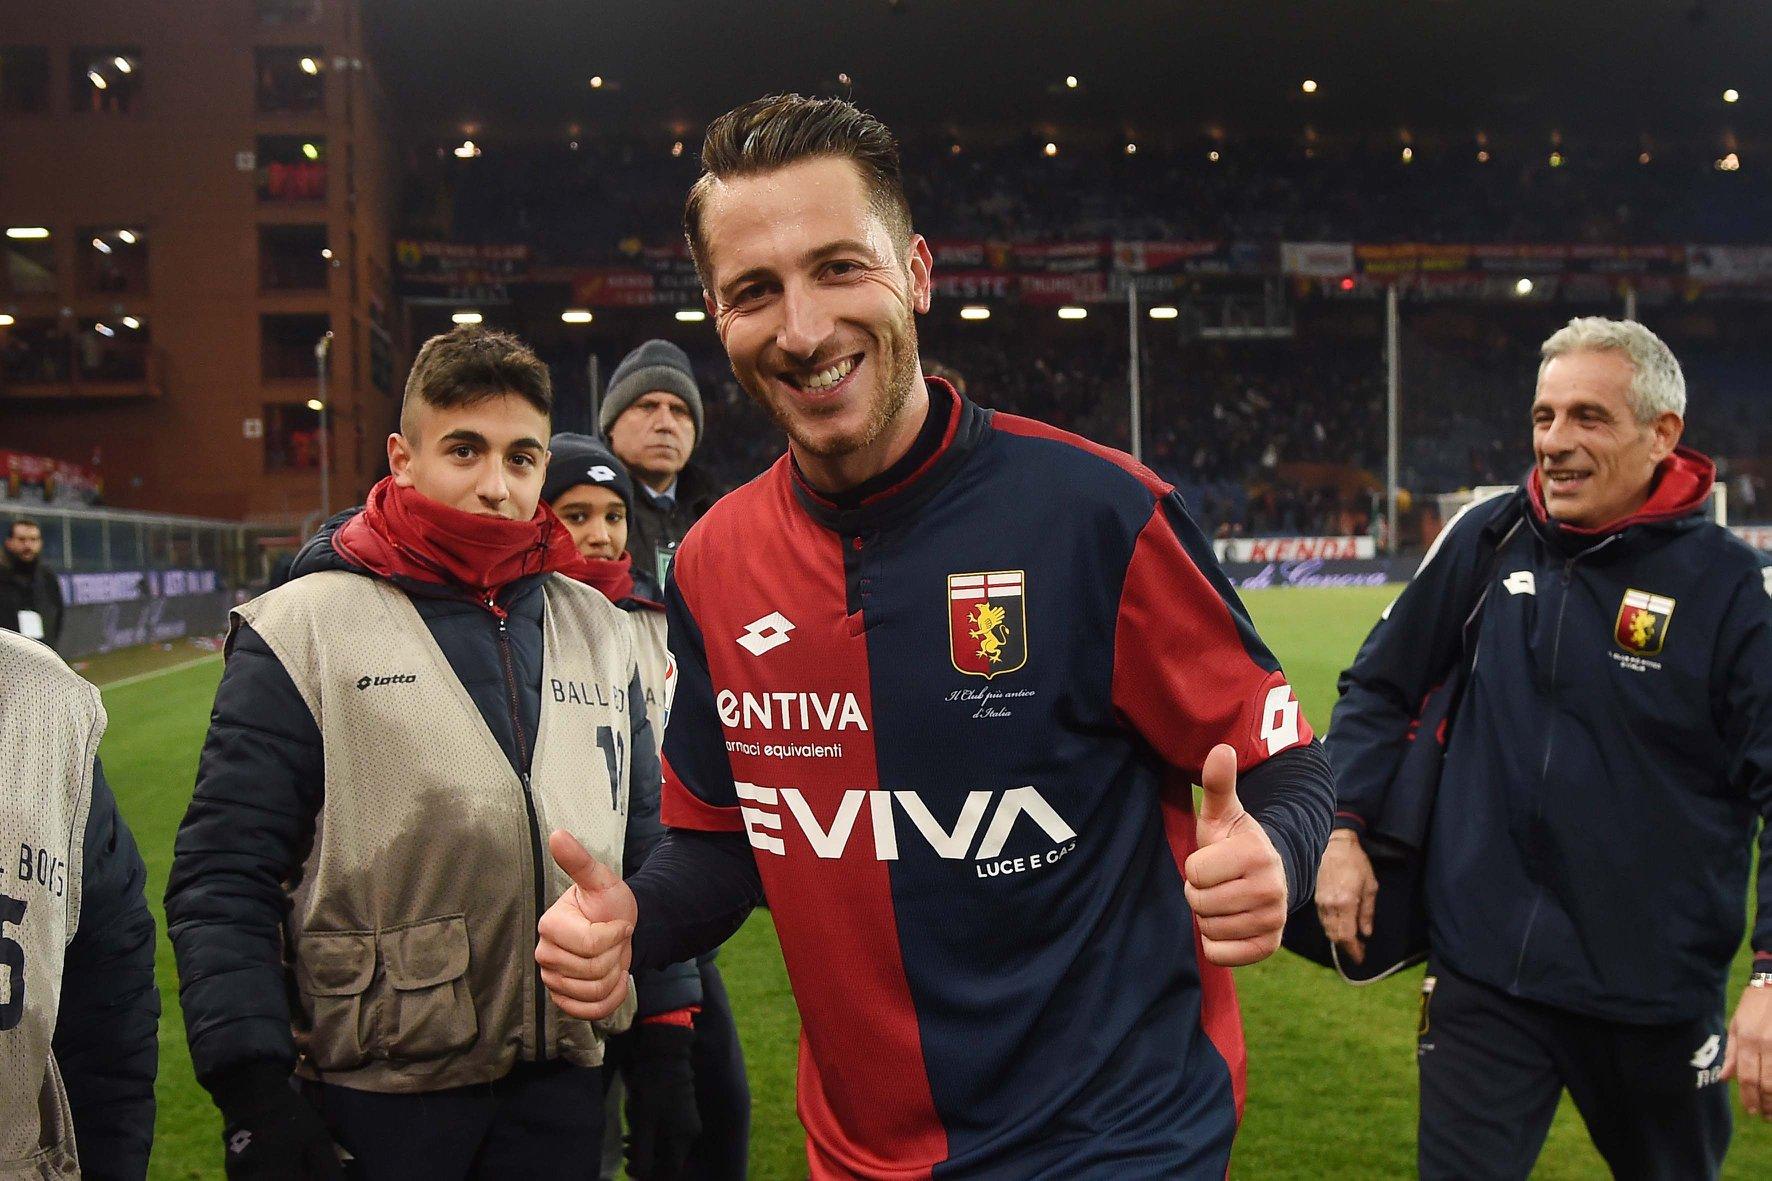 Calciomercato Milan: intesa per Laxalt a 18 milioni complessivi. Proposto Gonalons